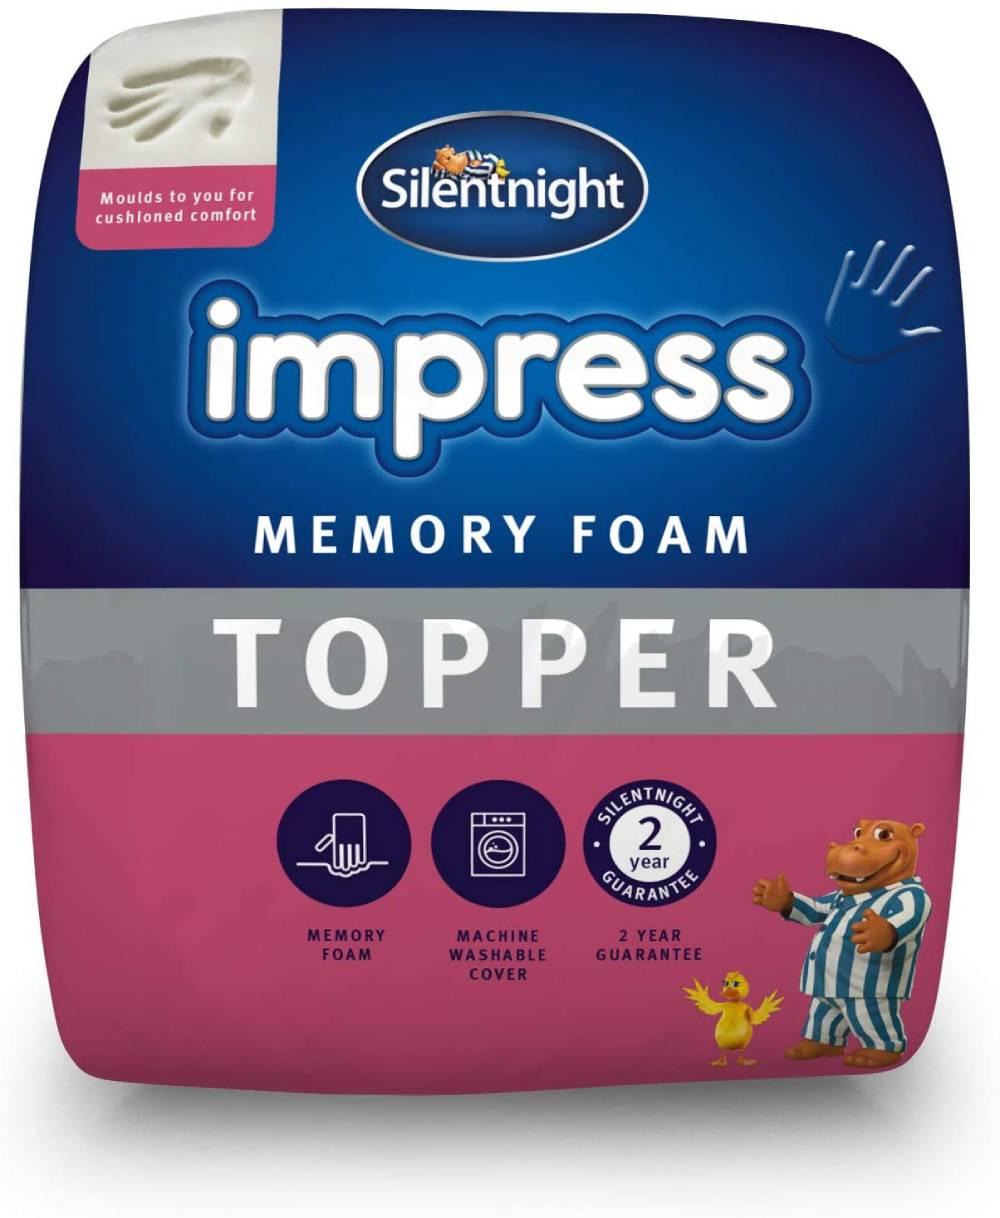 Silentnight Impress